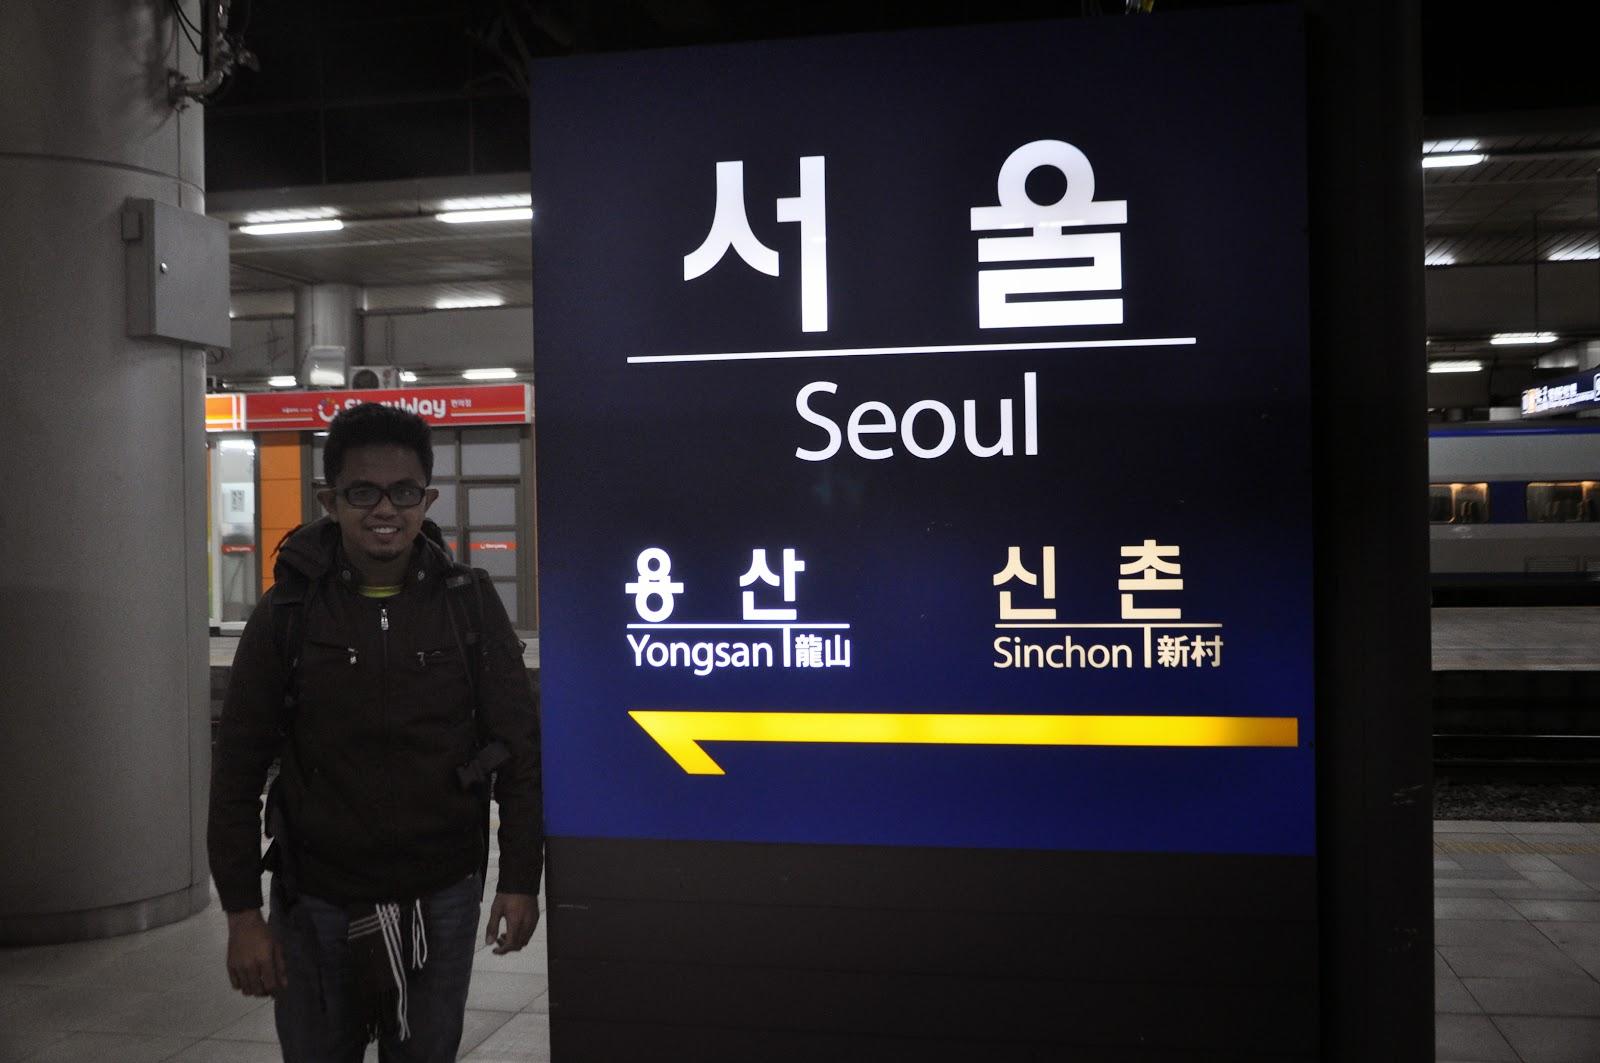 Thailand Search Date 2018 10 19 Mr Muscle Kitchen Orange Pouch 400ml Minimum  2 Item Yang Sama Khusus Area Pulau Jawa Signboard Di Seoul Station Korea